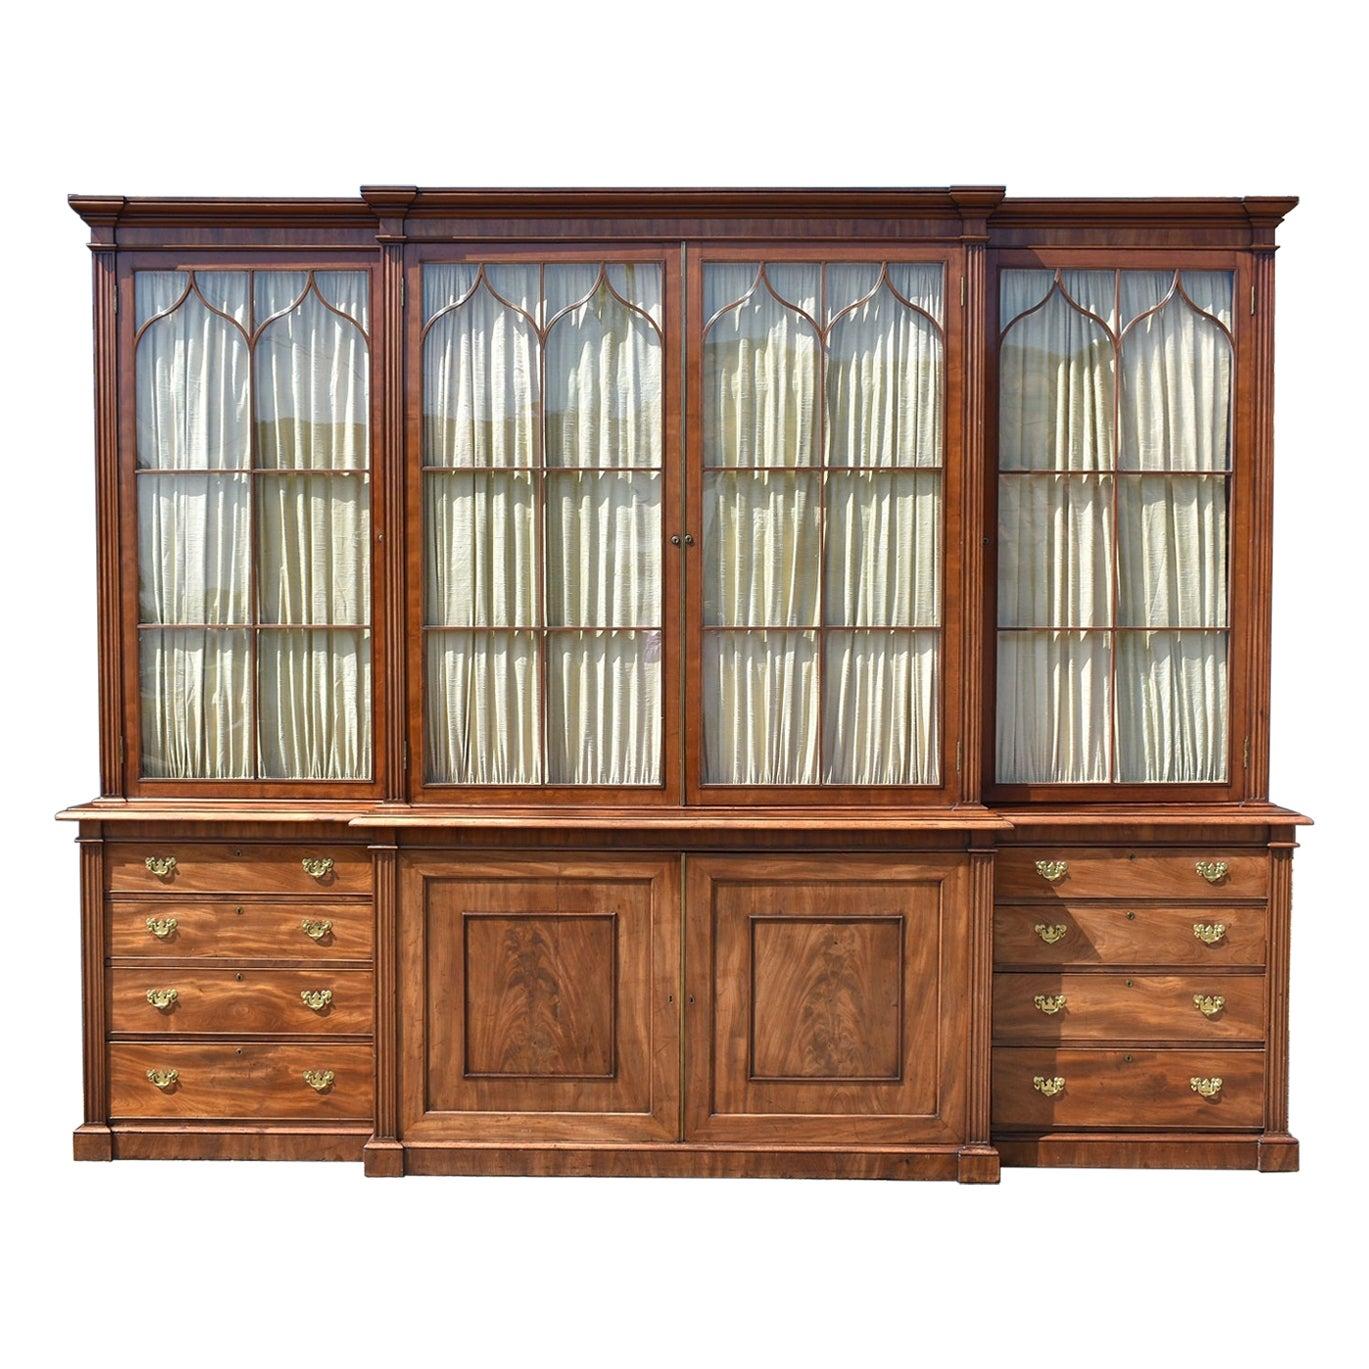 19th Century English George III Mahogany Breakfront Bookcase